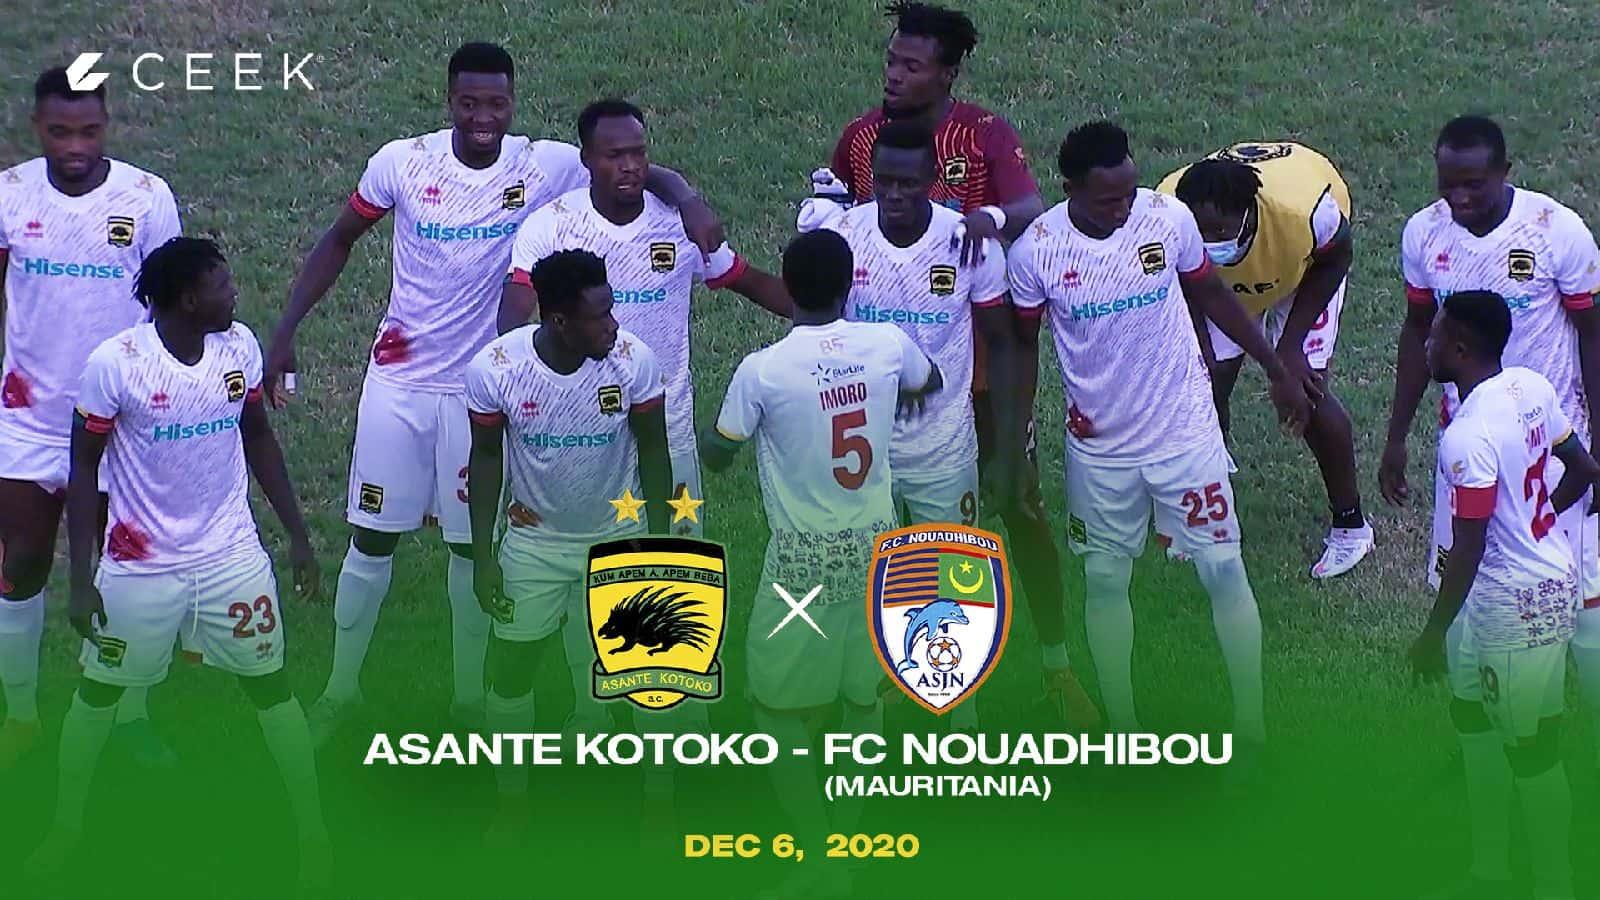 CAF Champions League - Asante Kotoko vs F.C. Nouadhibou ceek.com